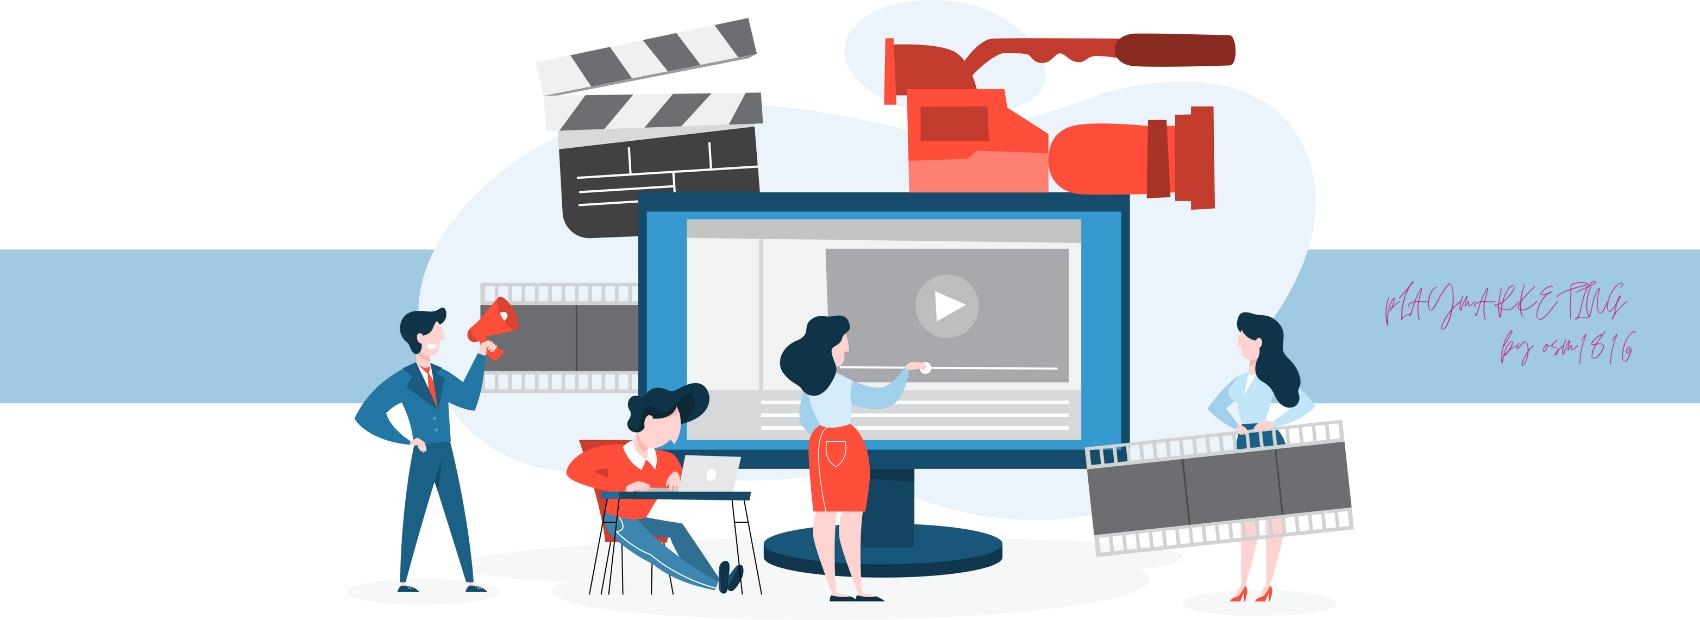 Corporate Video Marketing: 15 cose da sapere!